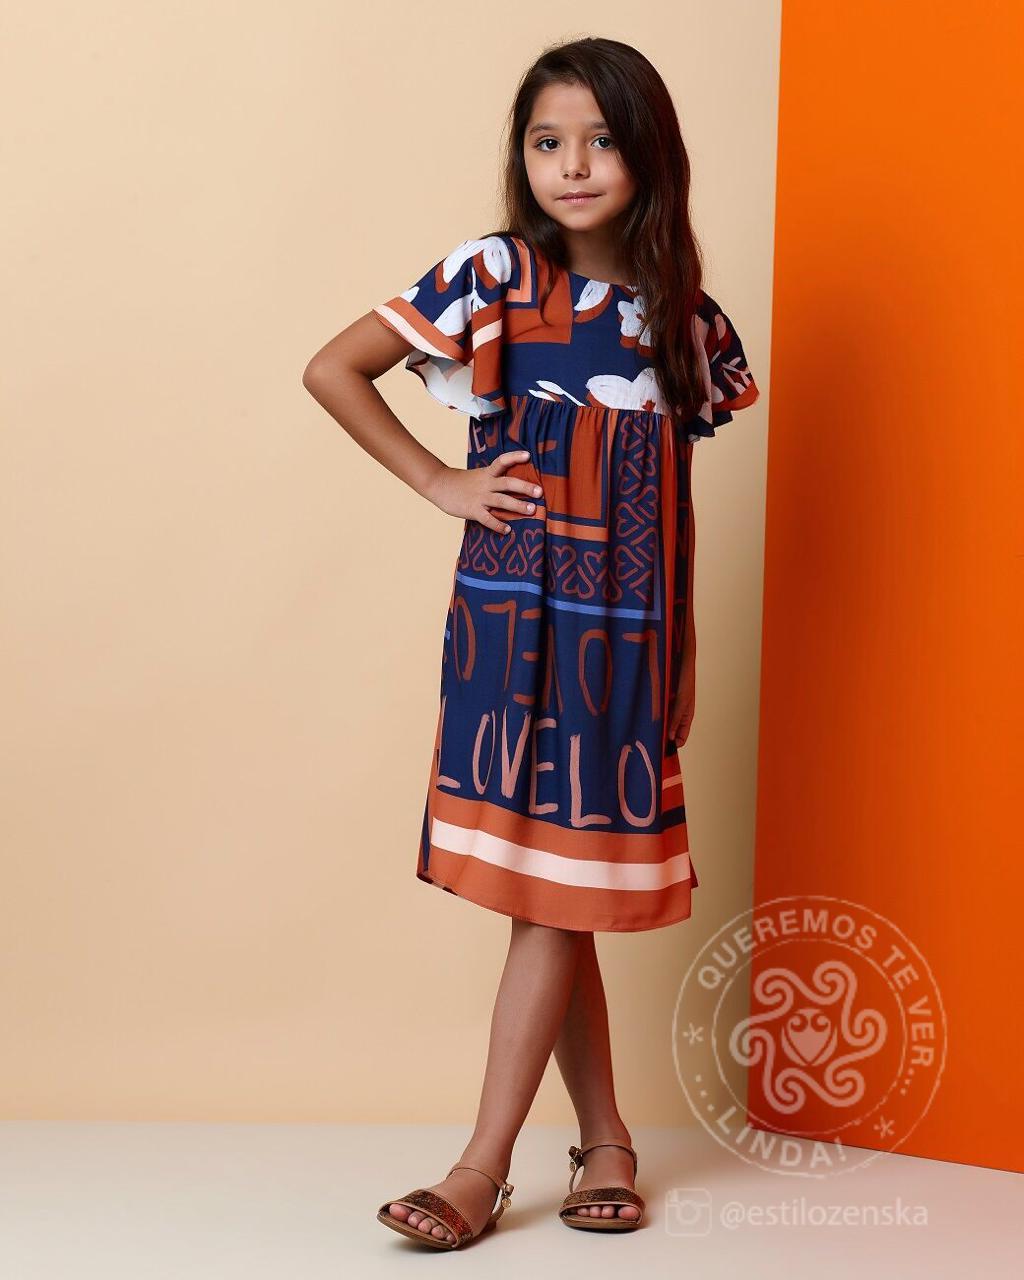 fa20f57539 loja+produtos+vestidos+vestido+0263101+renda+c+recortes